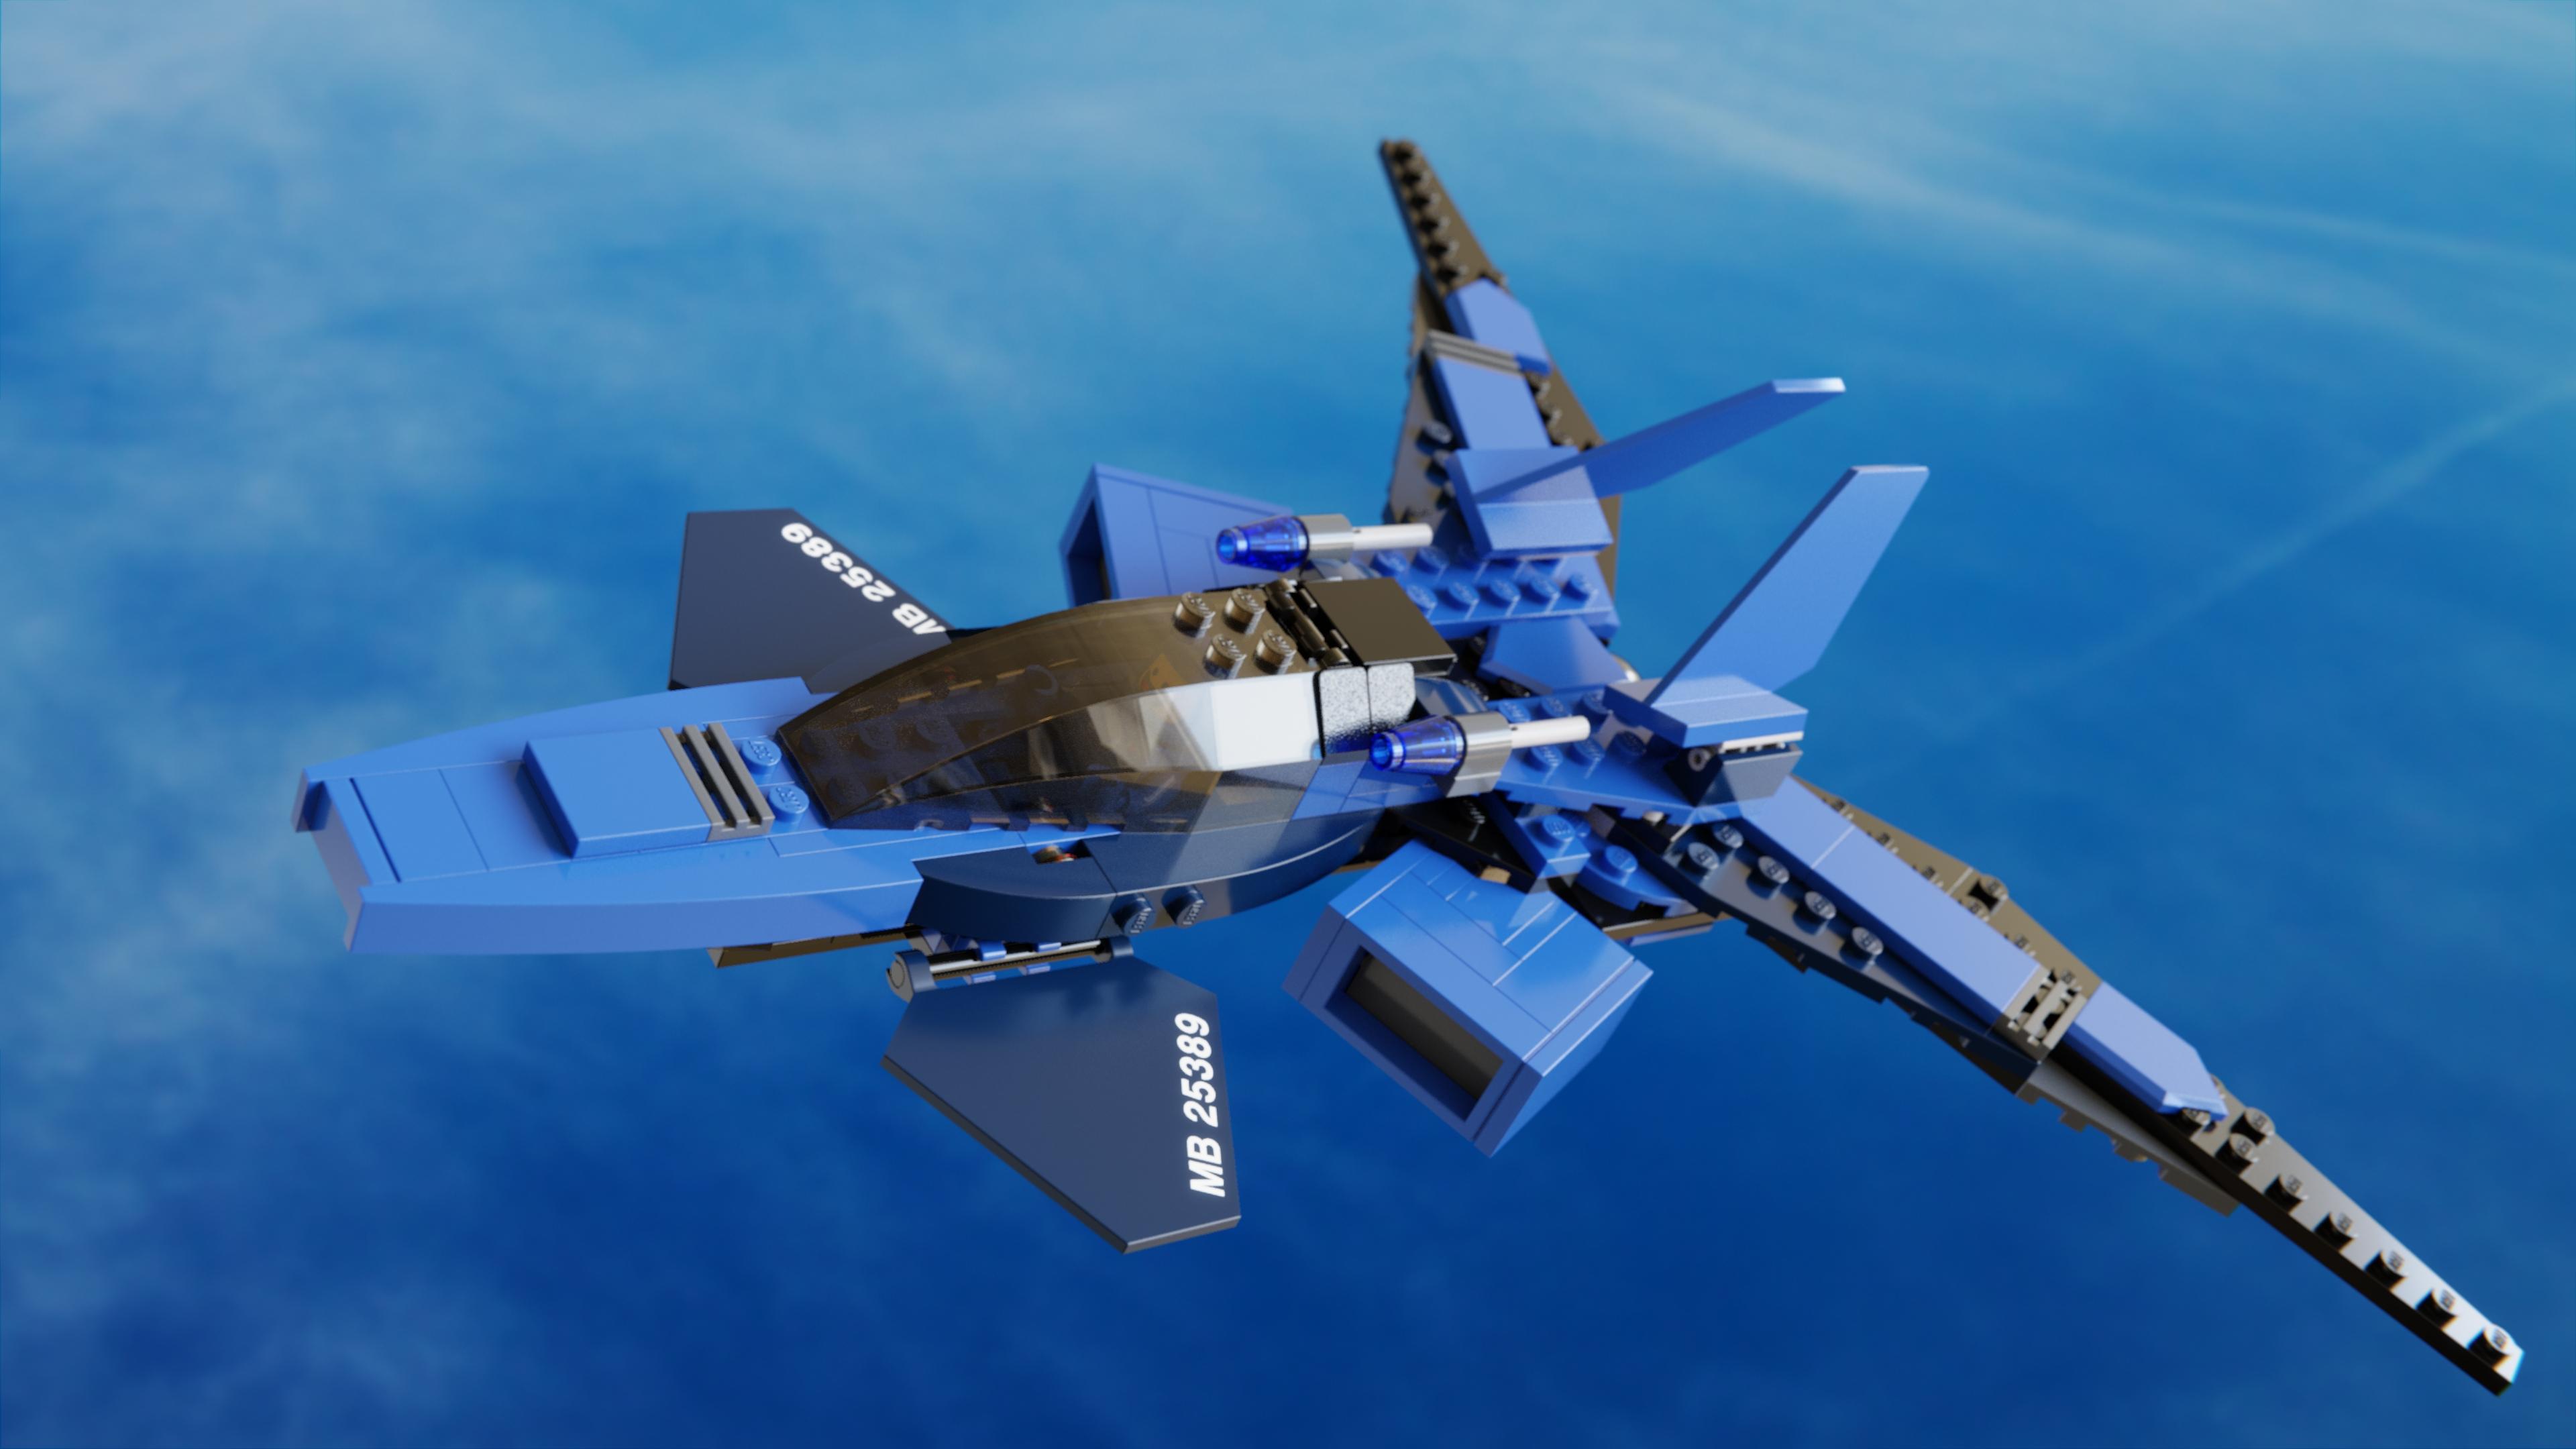 Wallpaper : LEGO, Blender, filmic, cycles, mecabricks